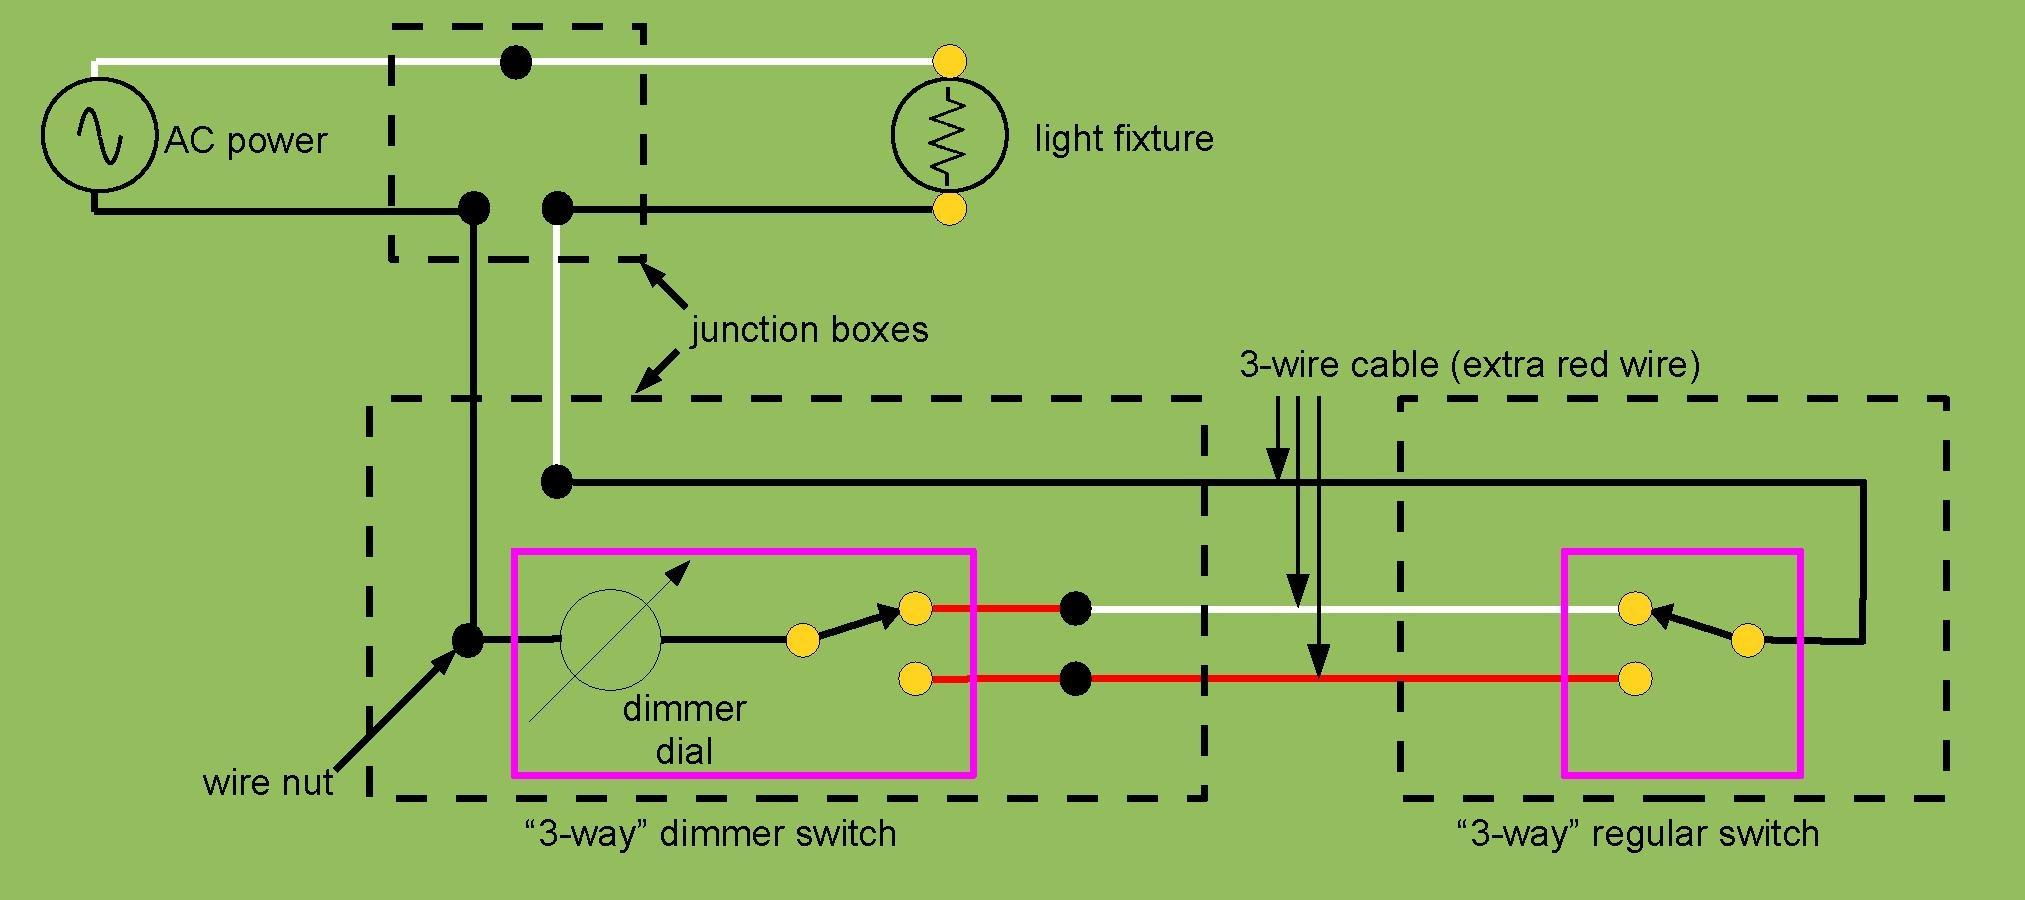 File:3-Way Dimmer Switch Wiring.pdf - Wikimedia Commons - 3 Way Dimmer Switch Wiring Diagram